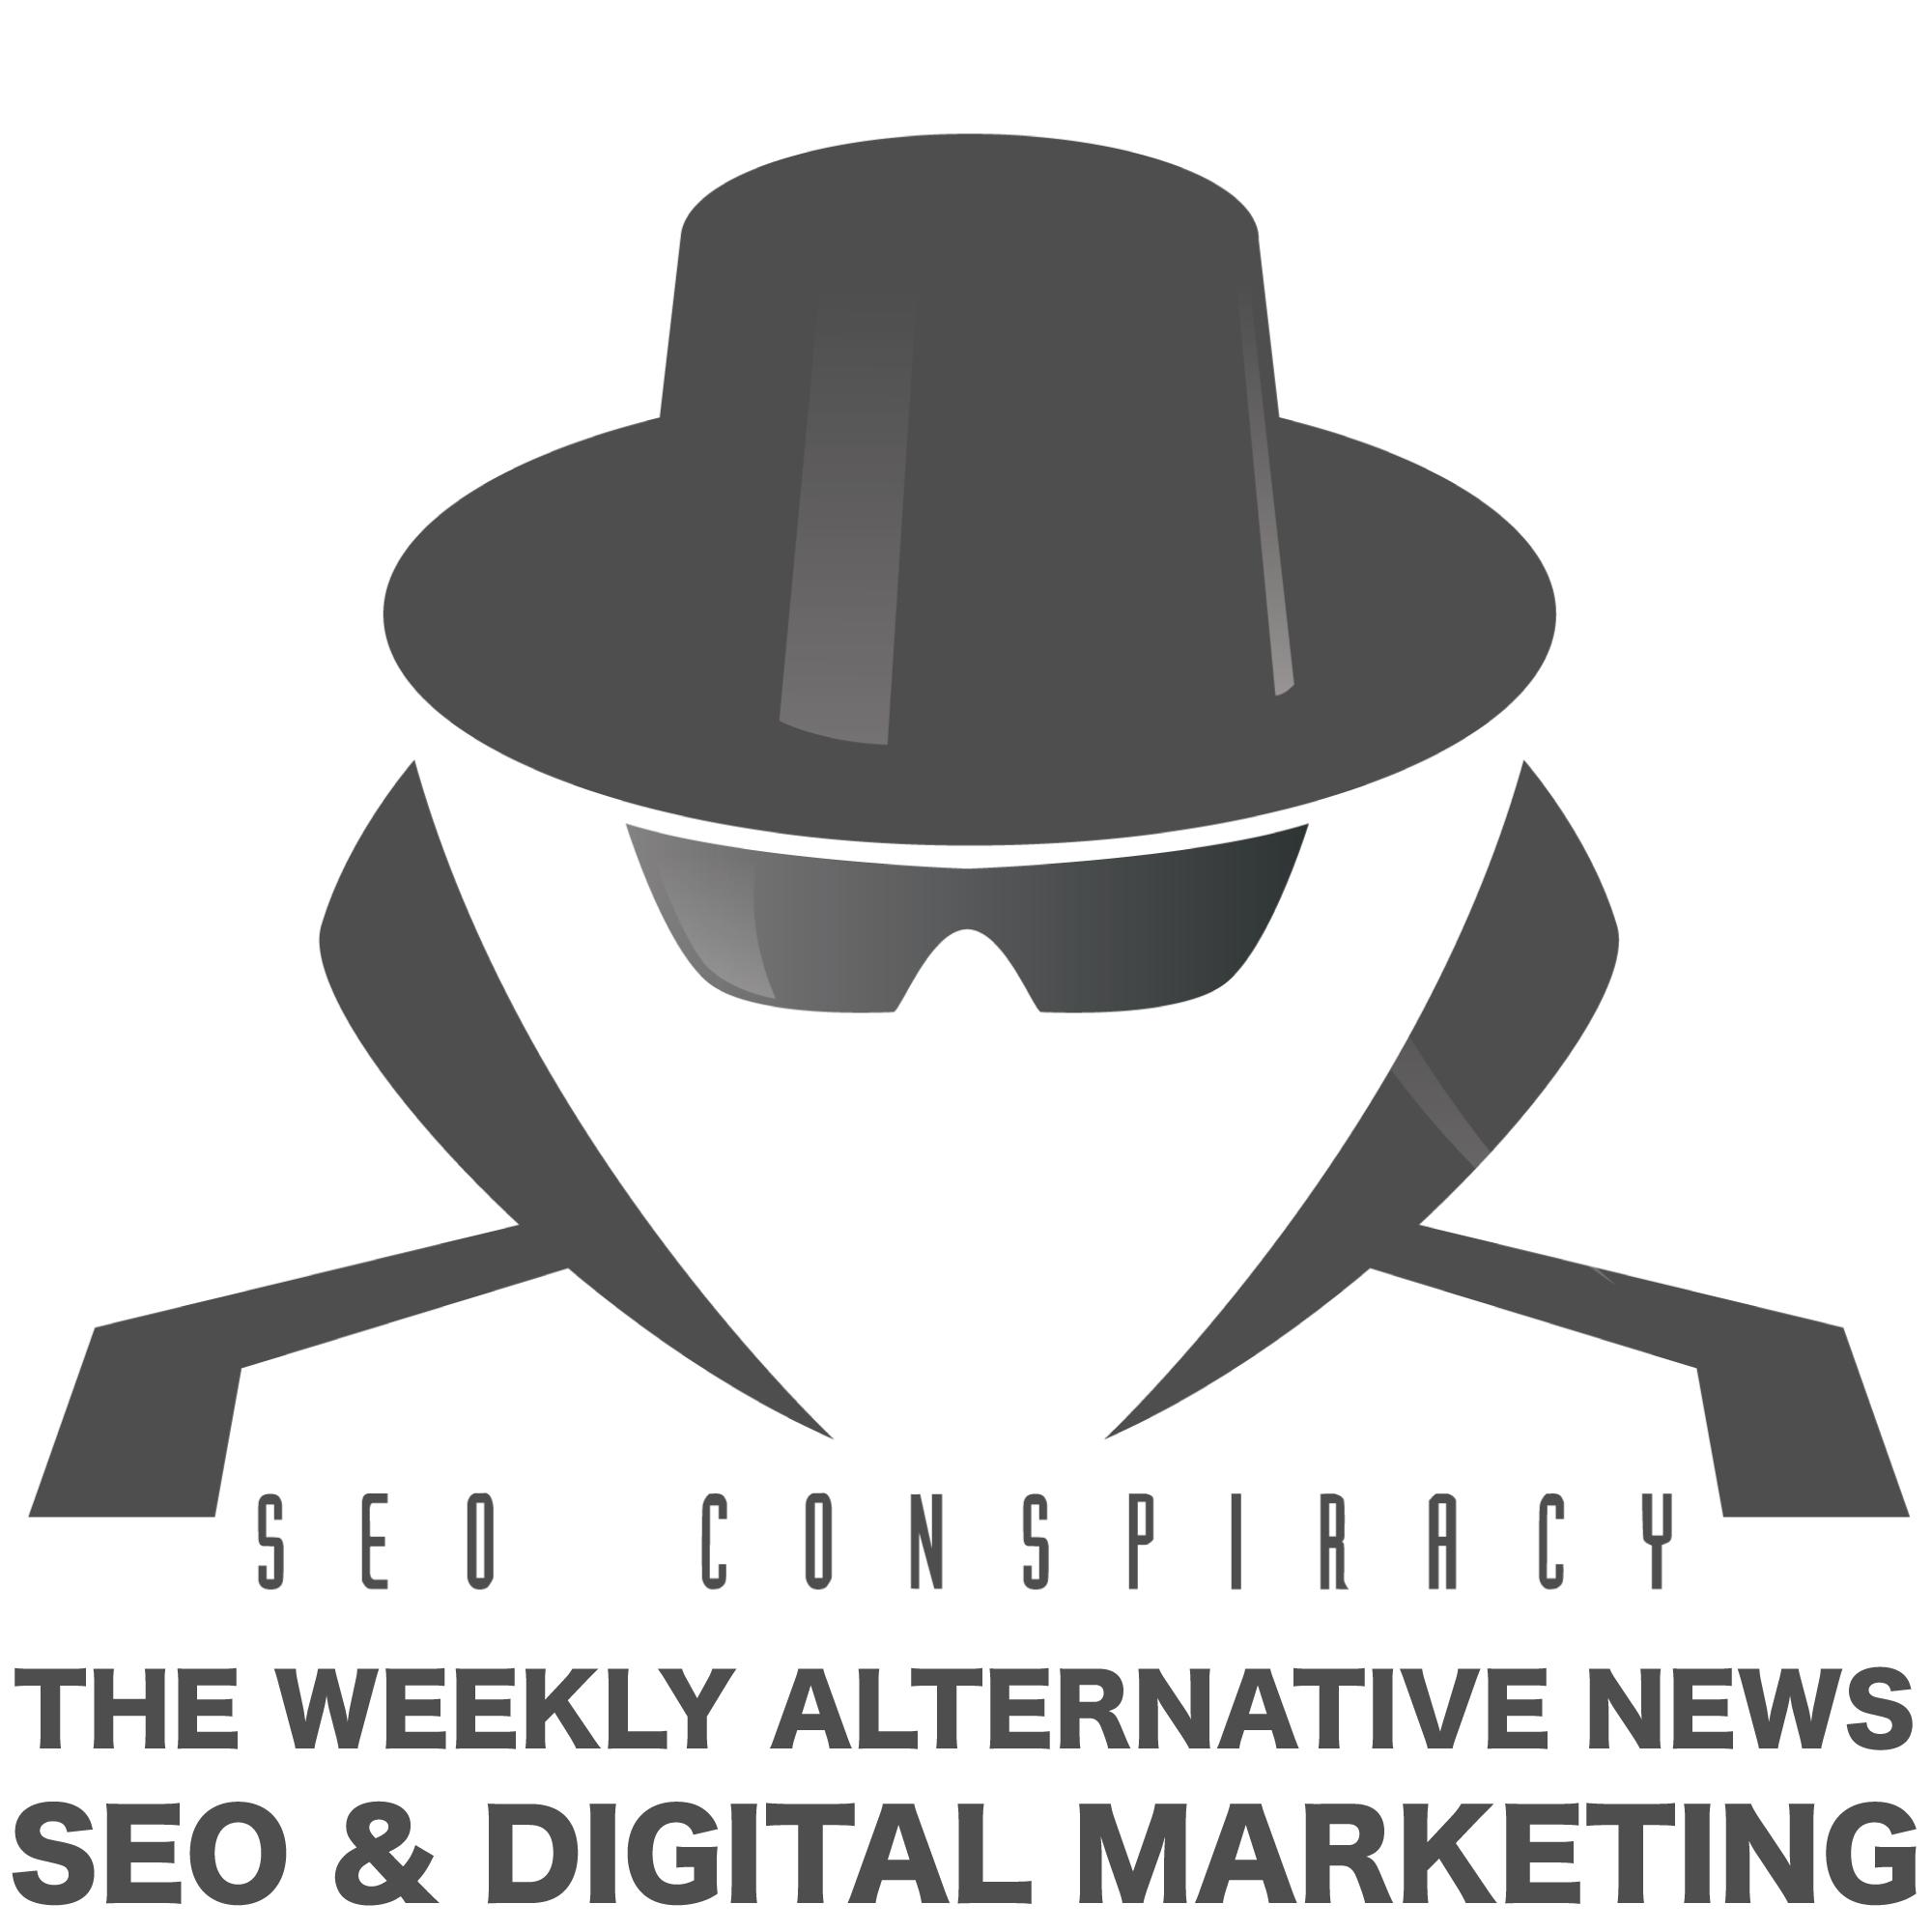 SEO & Digital Marketing Alternative Search News